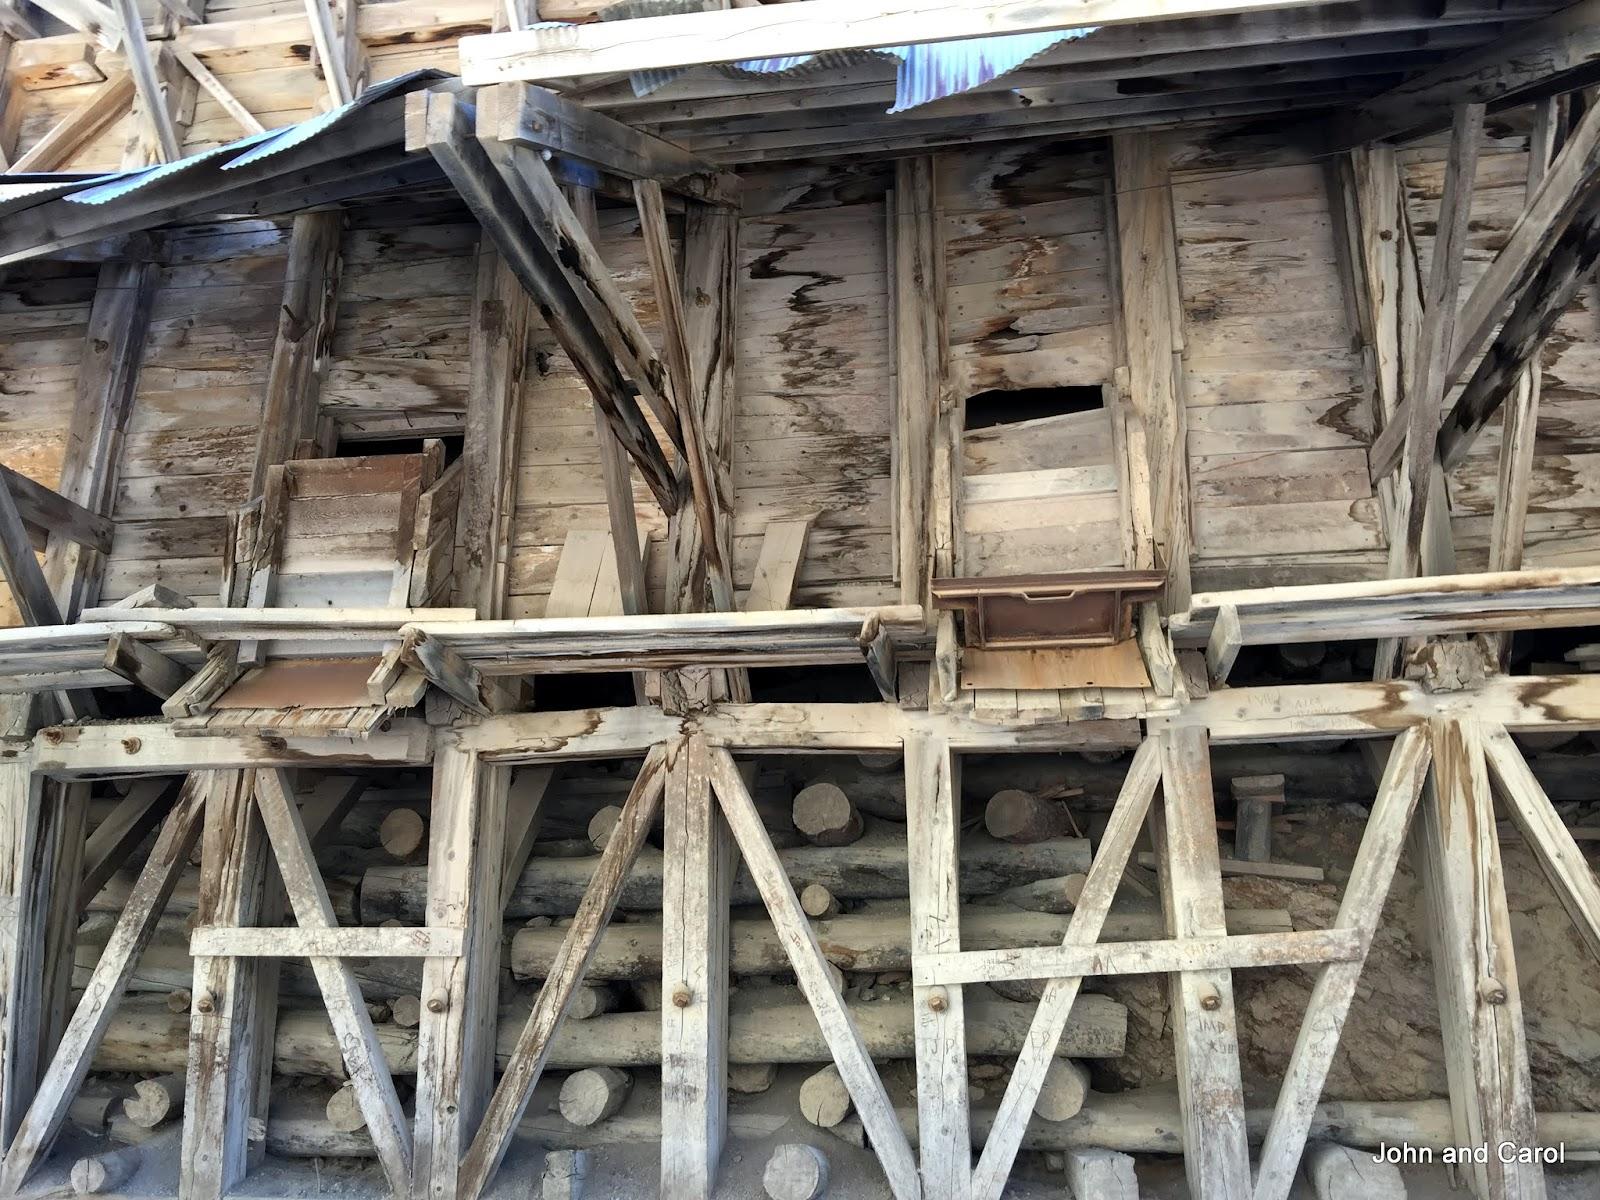 5th-Wheel Wanderings: Mining Relics